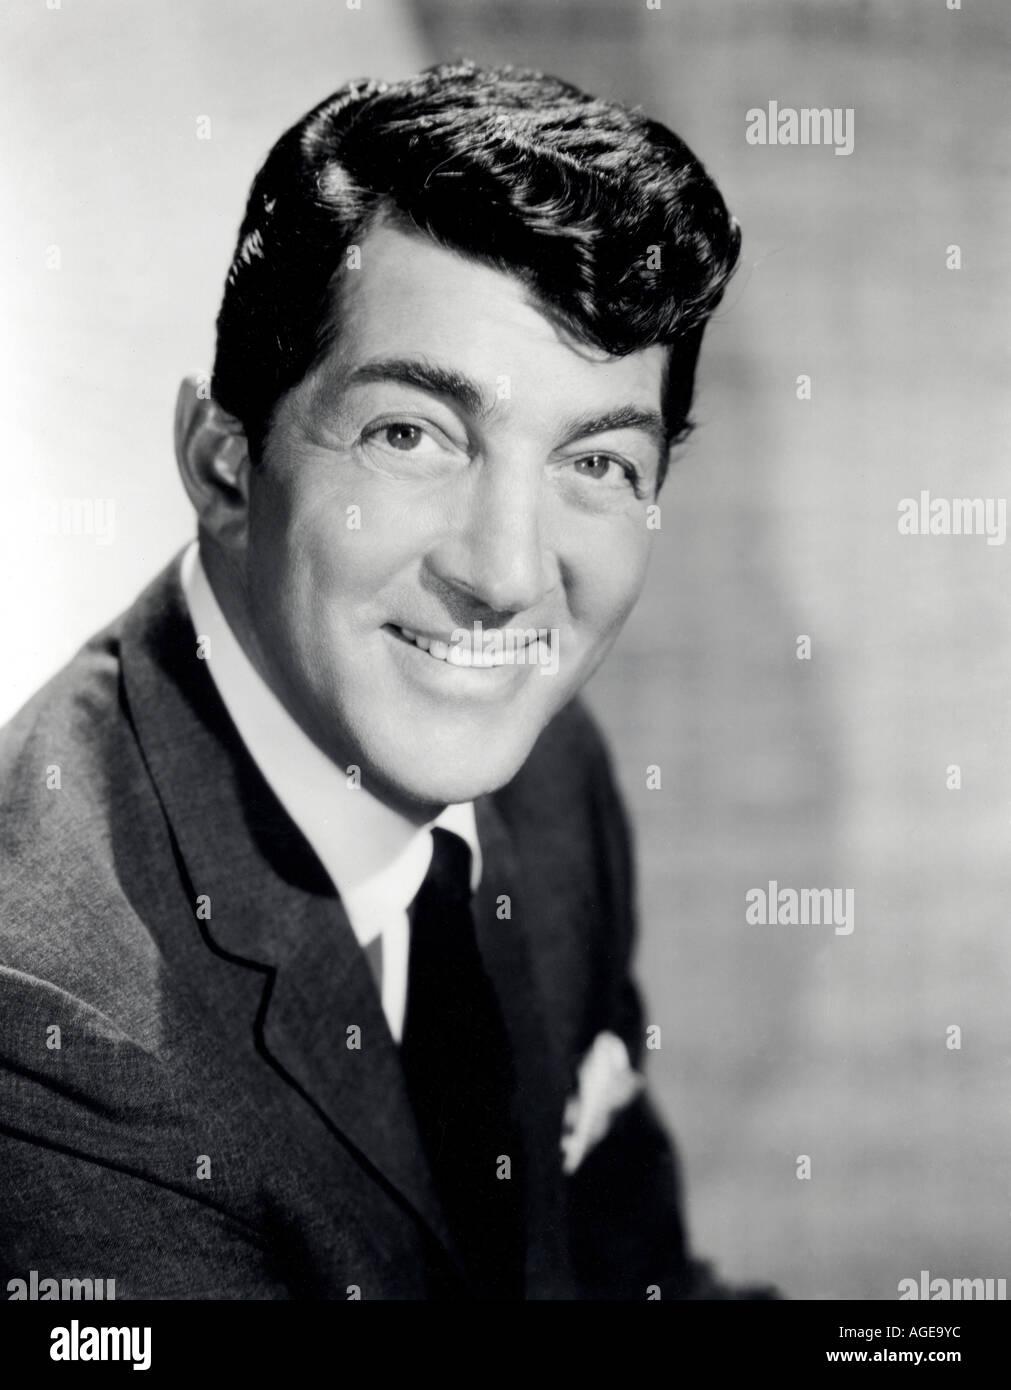 DEAN MARTIN US singer actor - Stock Image